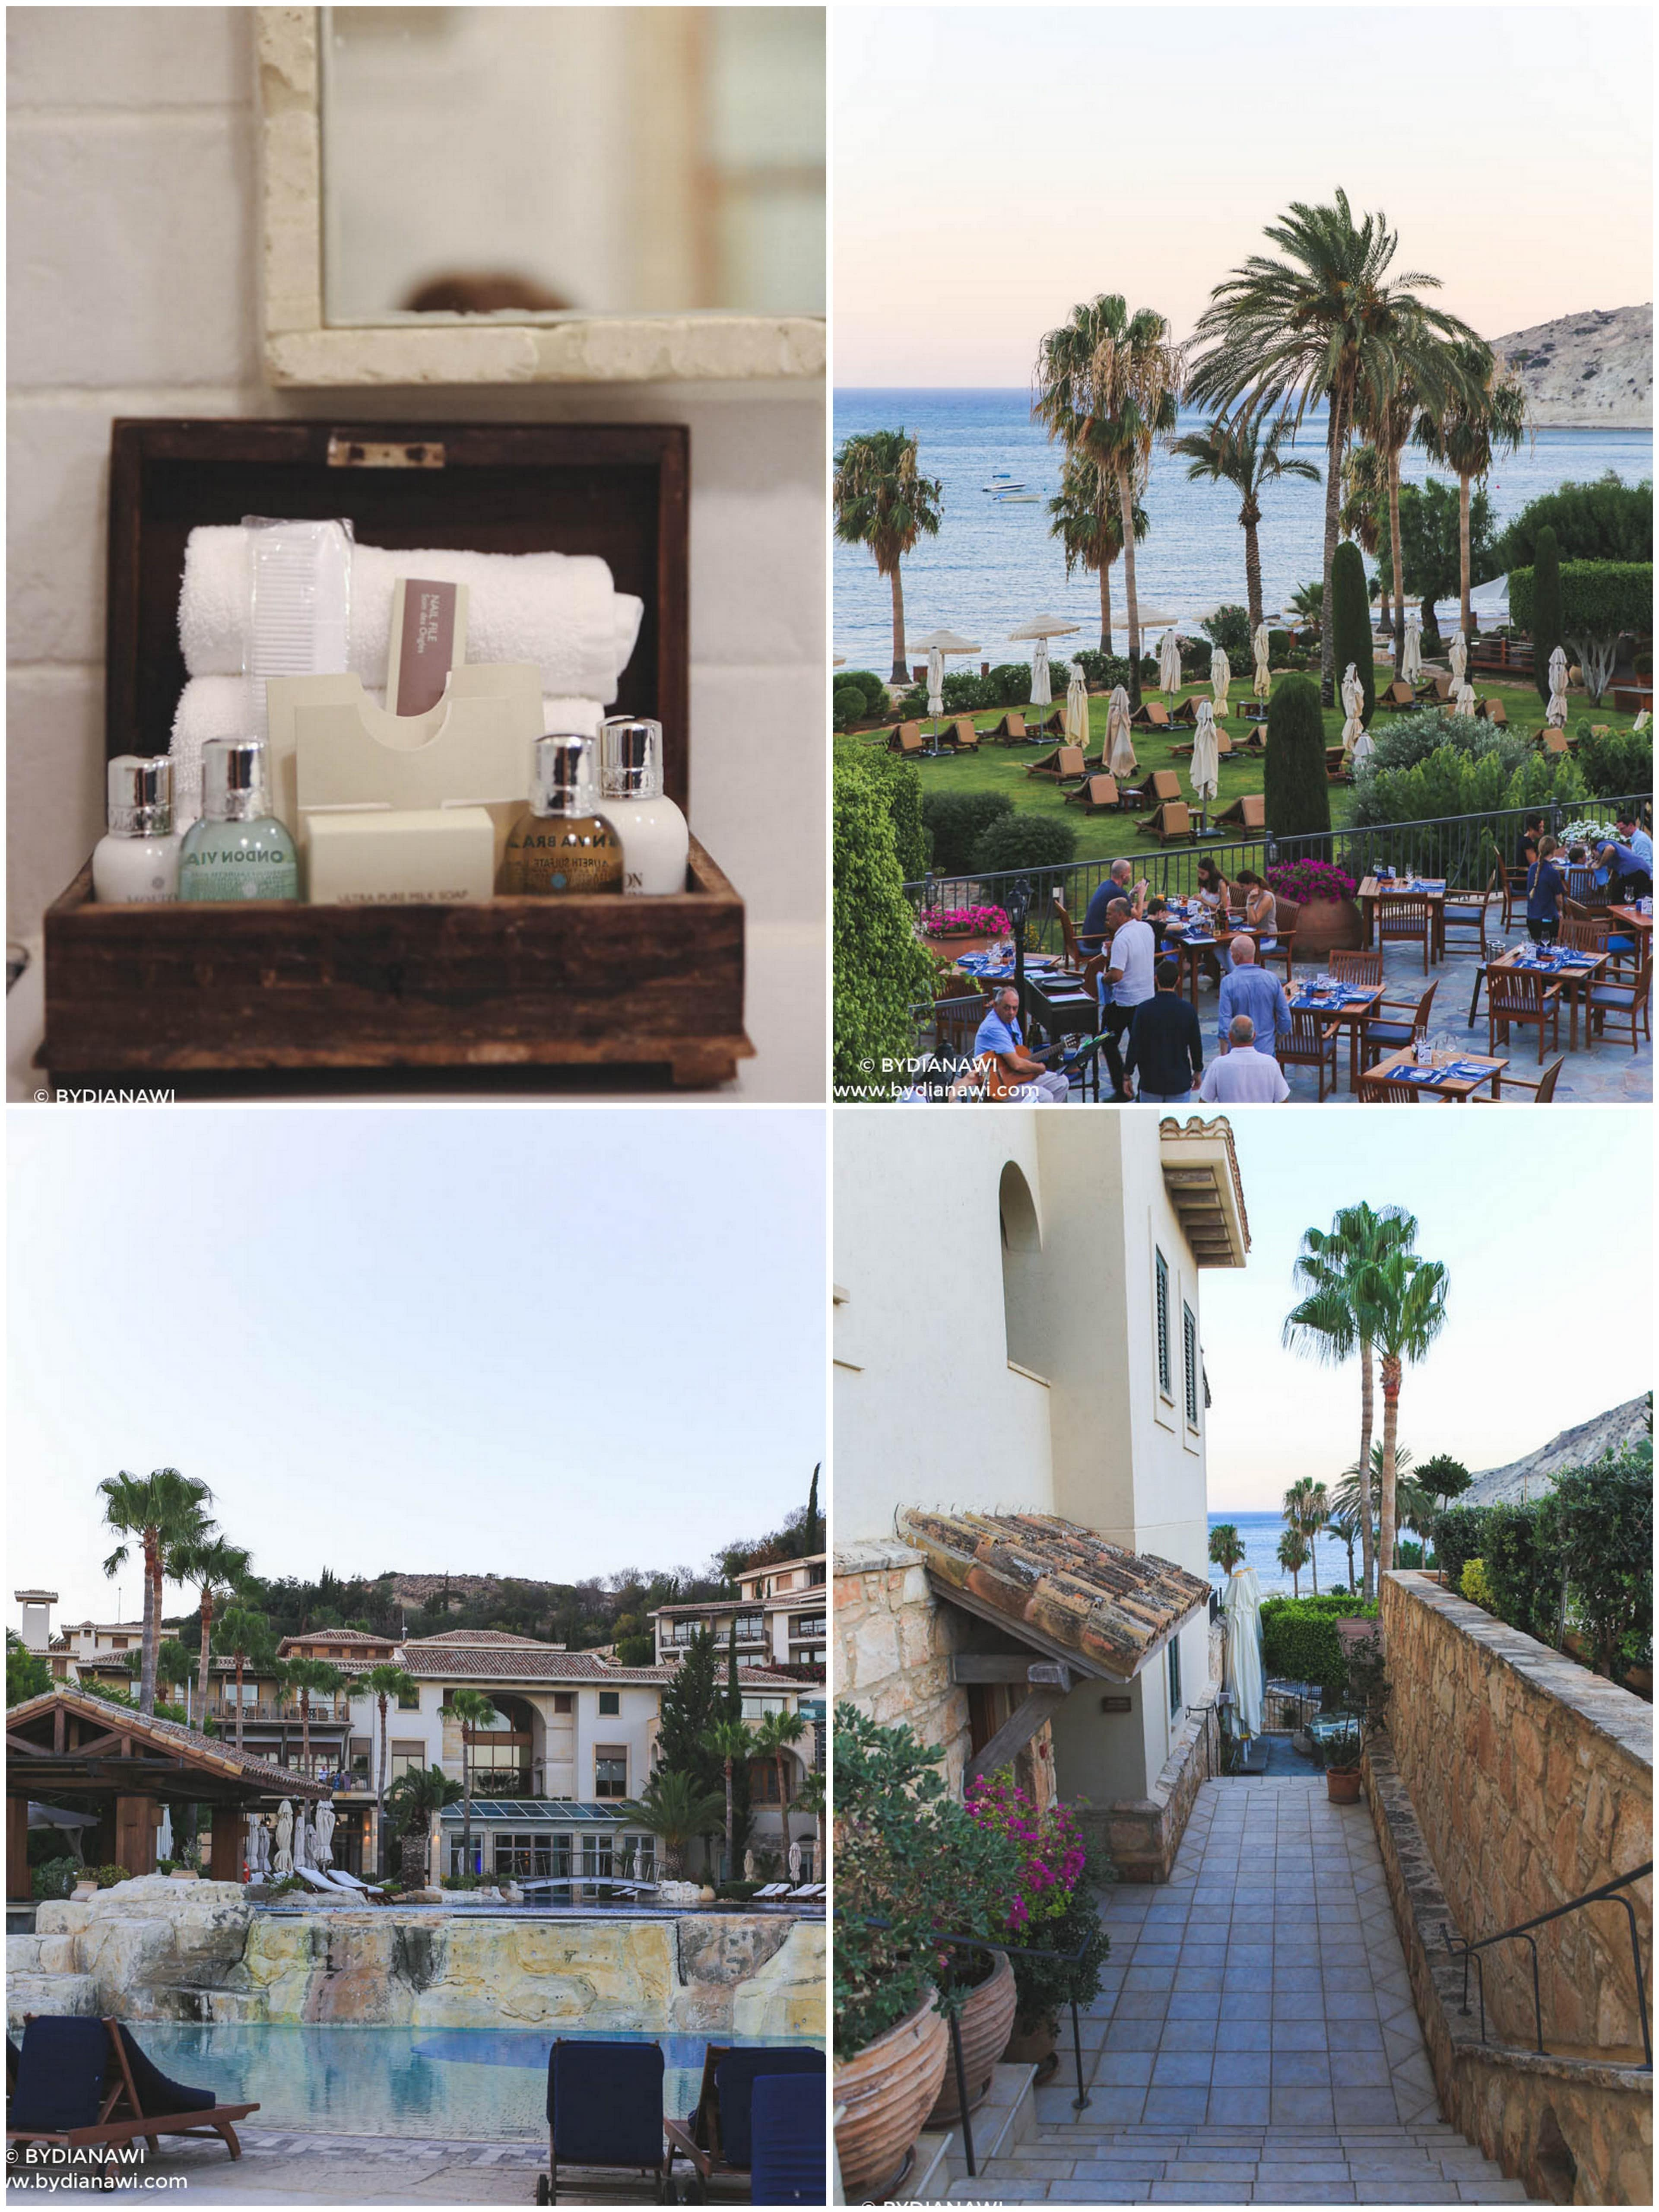 columbia beach resort, cypern, grækenland